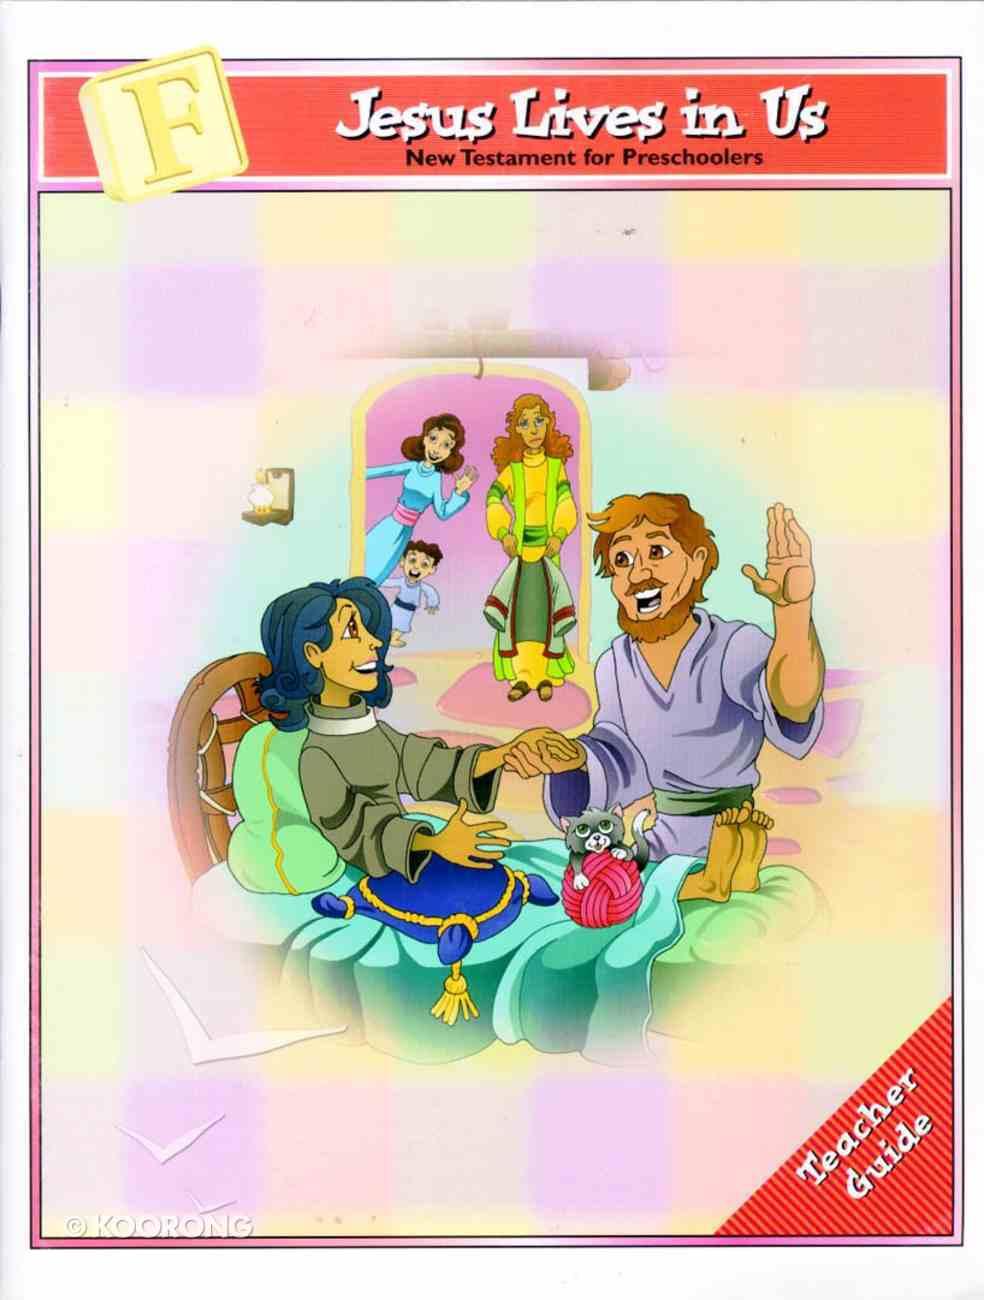 Dlc Preschool: NT, Unit F Ages 2-5 (Teacher) (Discipleland Preschool, Ages 3-5 Series) Paperback